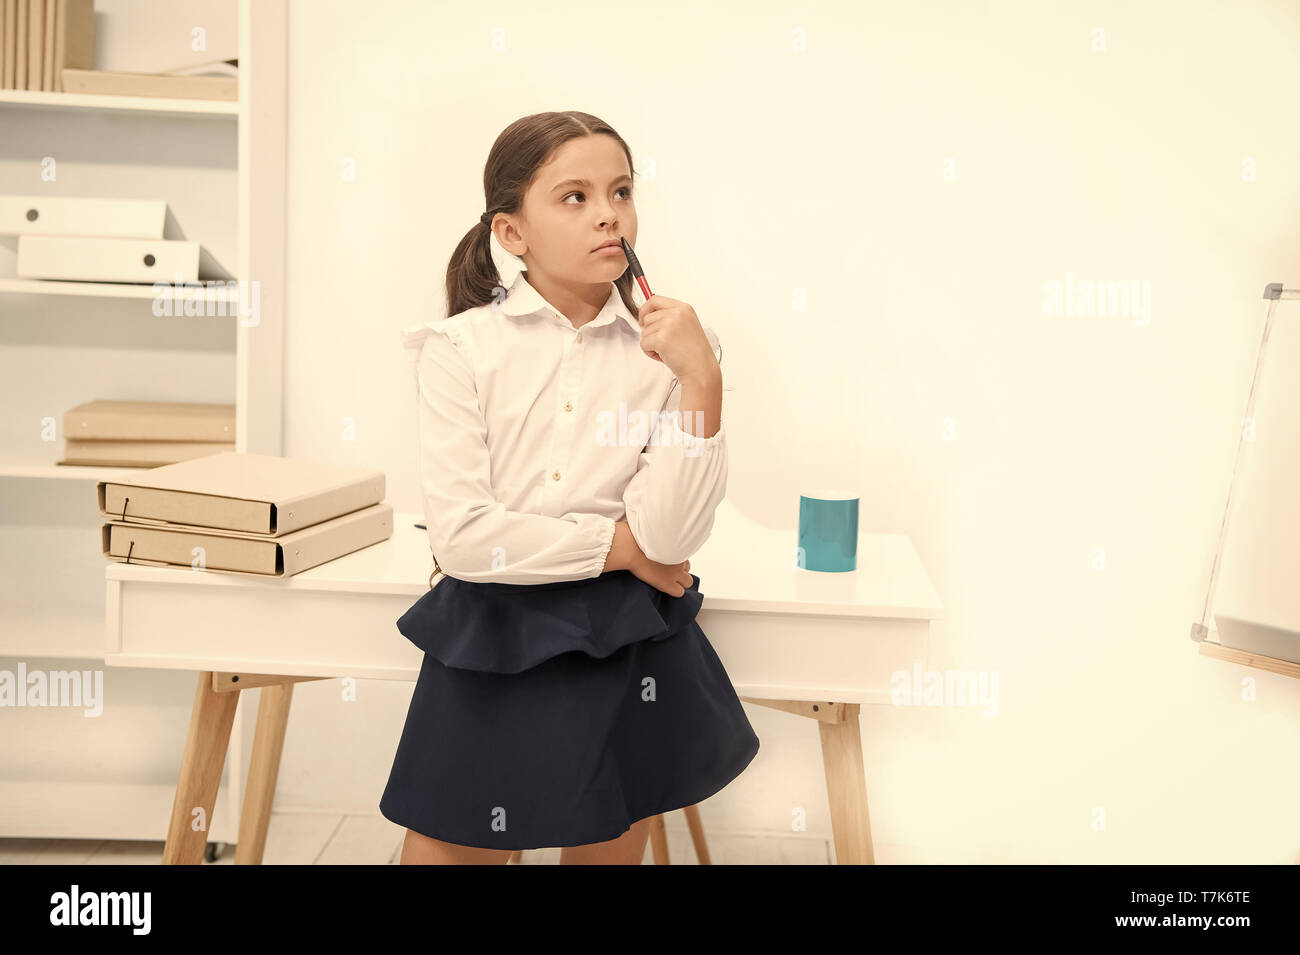 Genius concept. Genius girl lost in thoughts. Genius child solve problem. Genius pupil back to school. Use your brain. - Stock Image